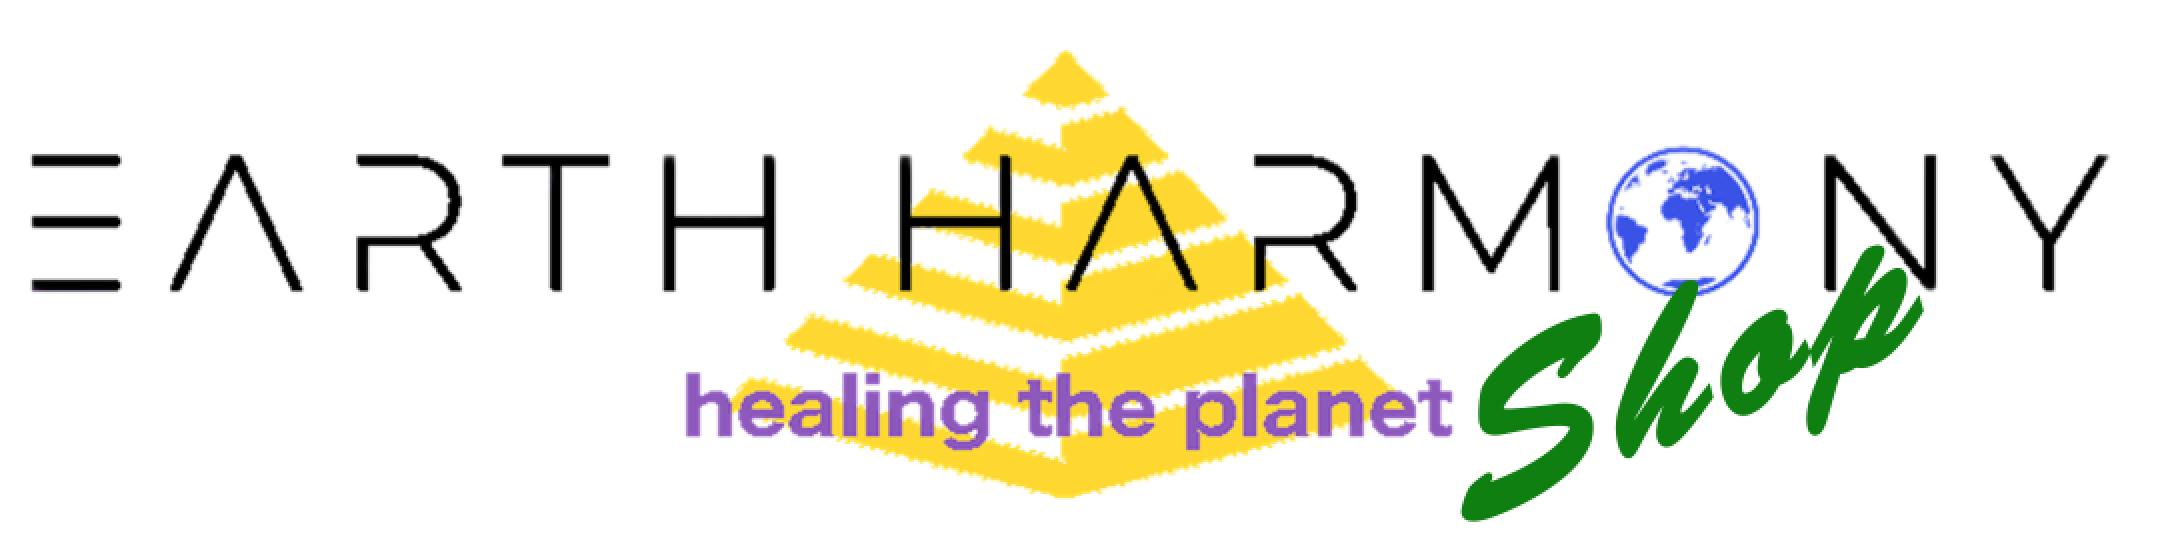 Earth-Harmony-Shop